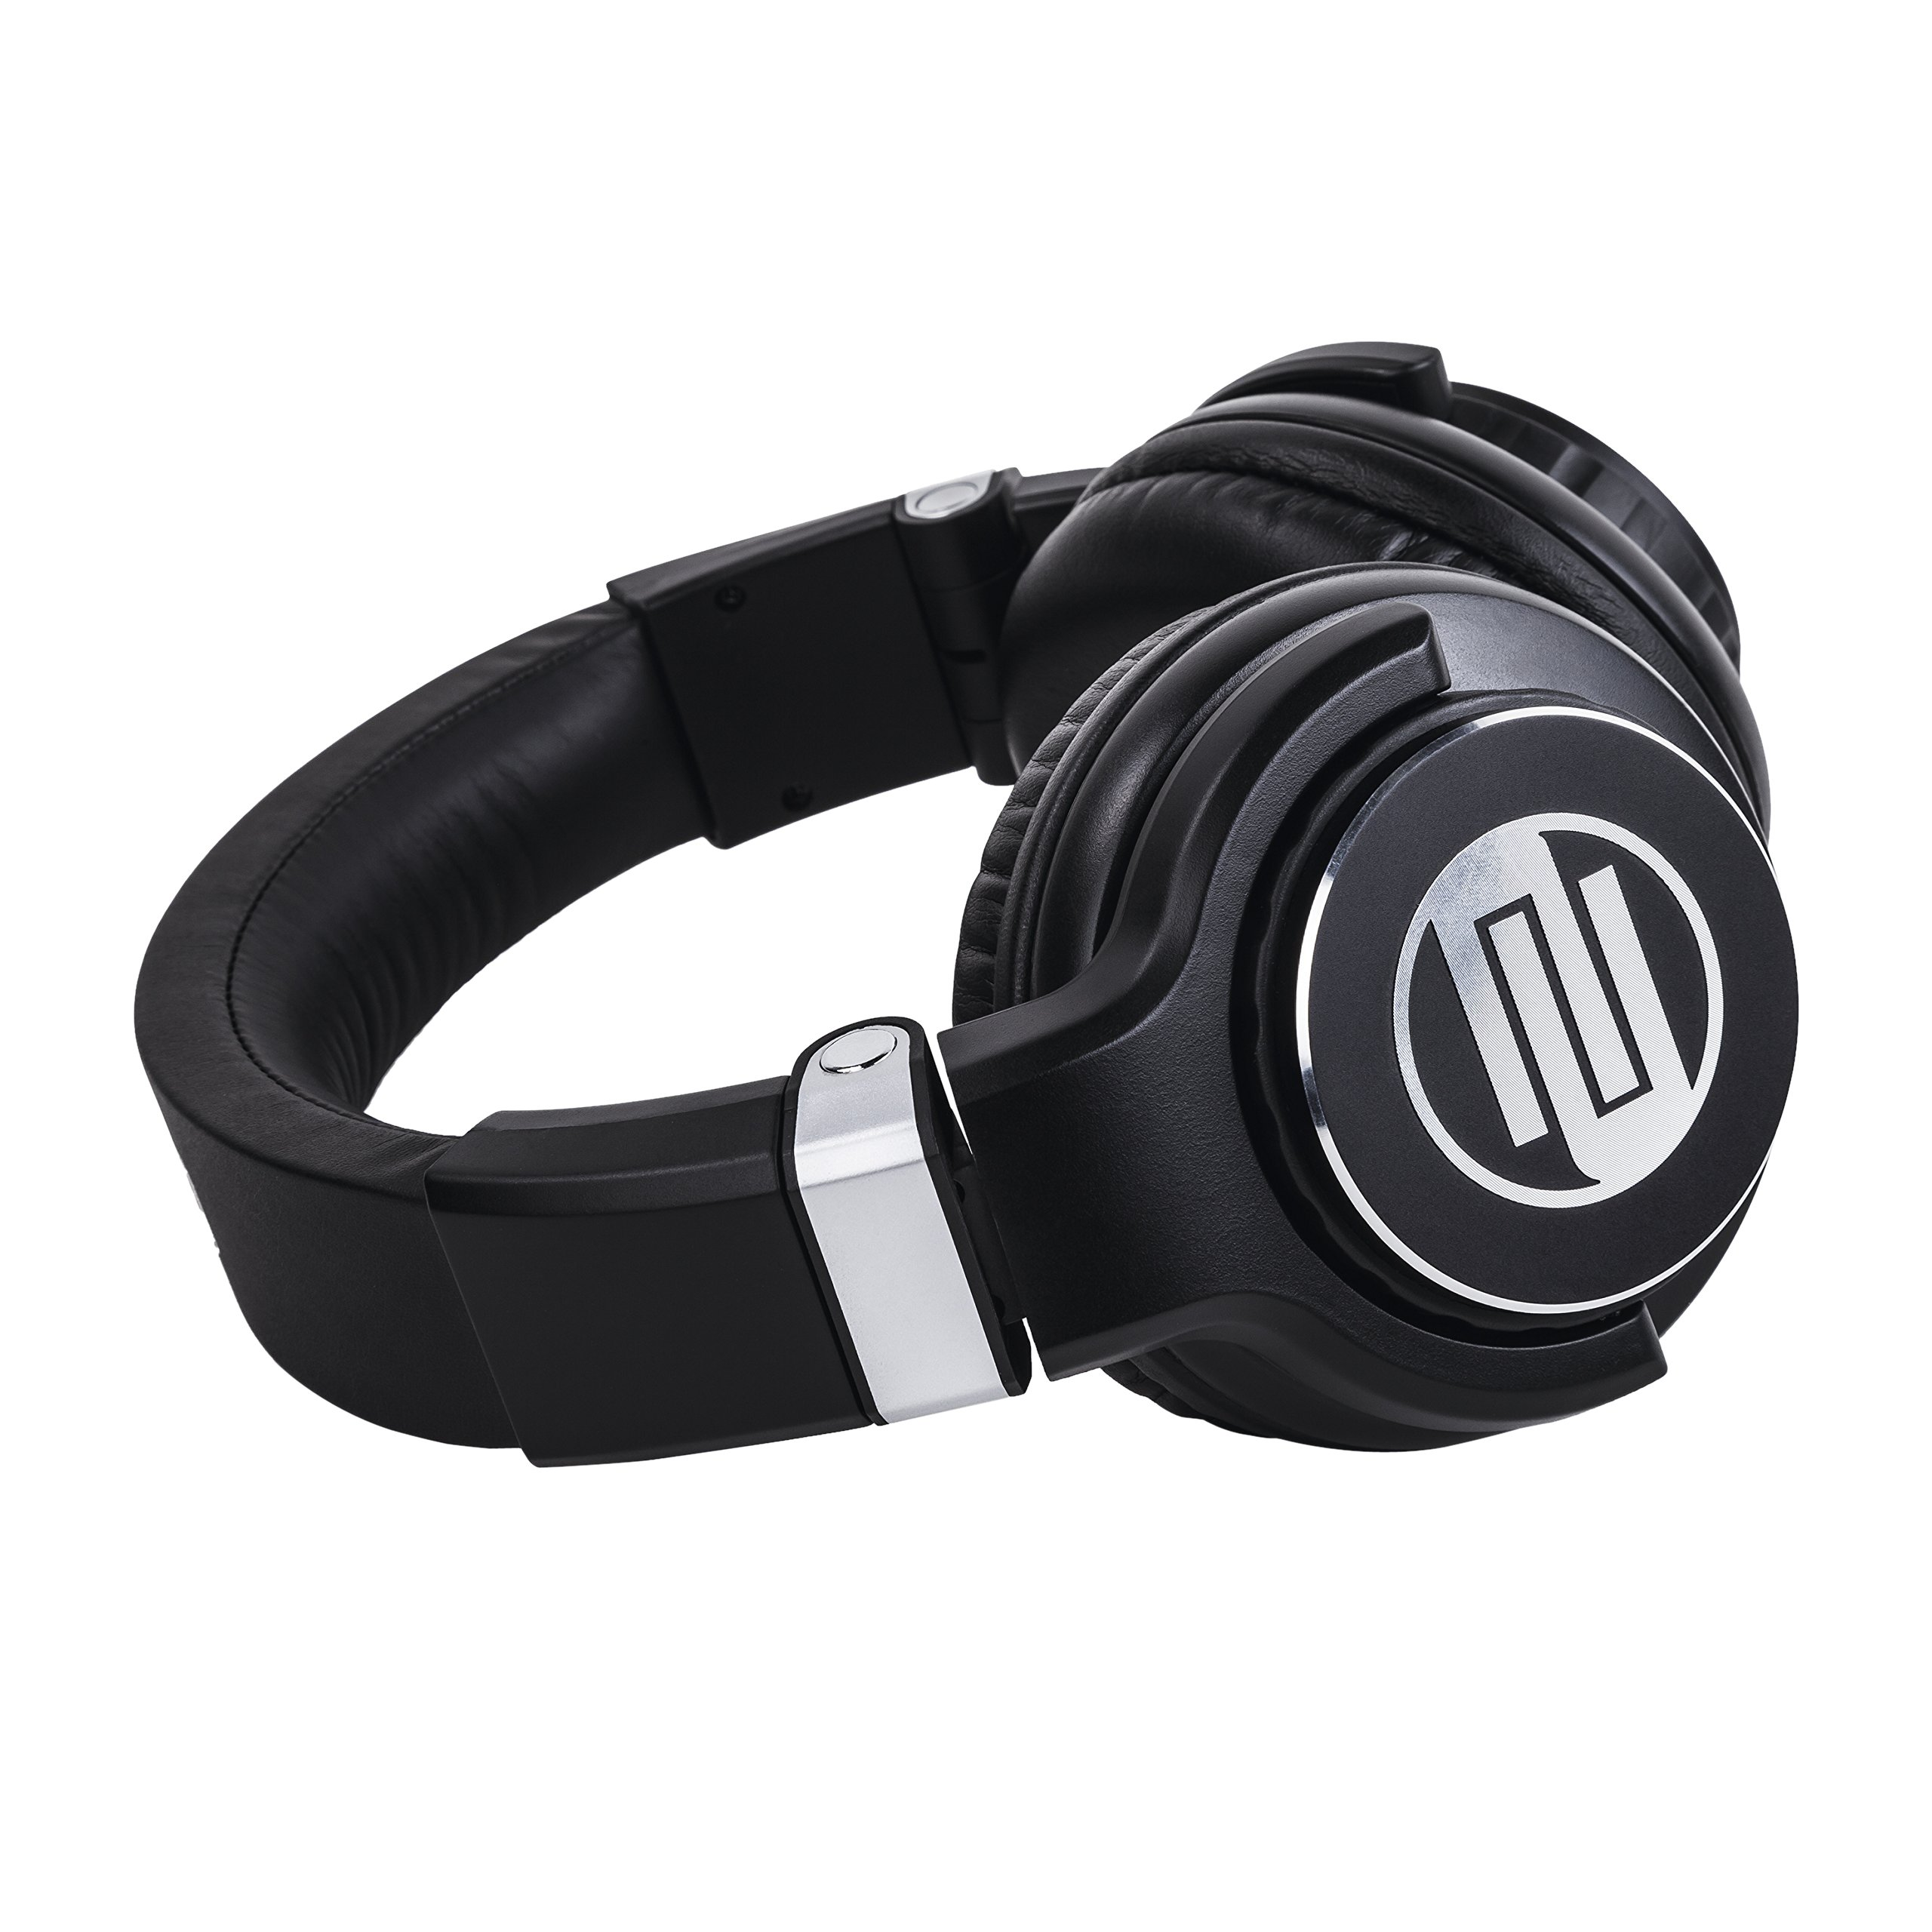 Reloop RHP-15 Professional DJ Headphones, Closed Construction, 50mm Drivers